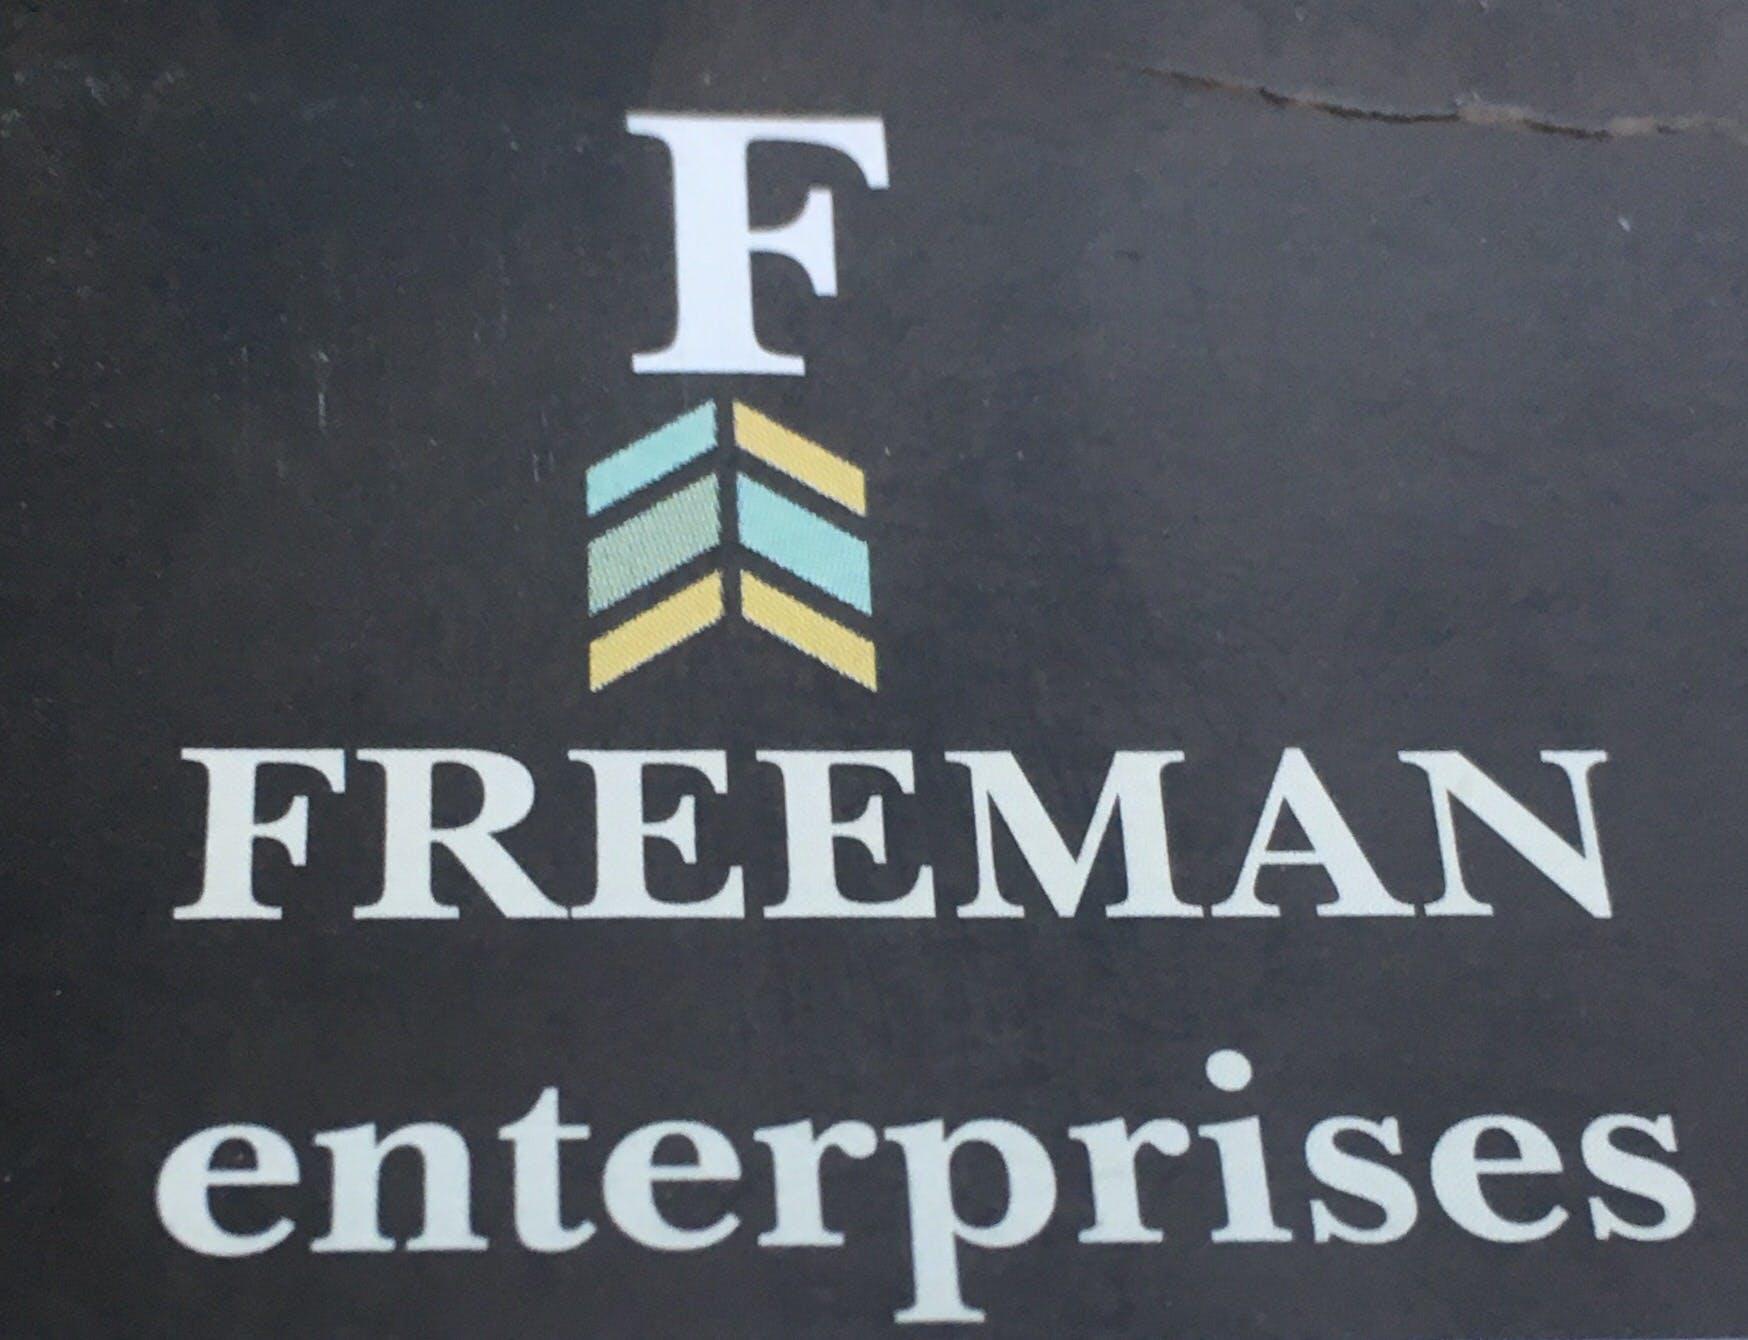 Freeman Enterprises